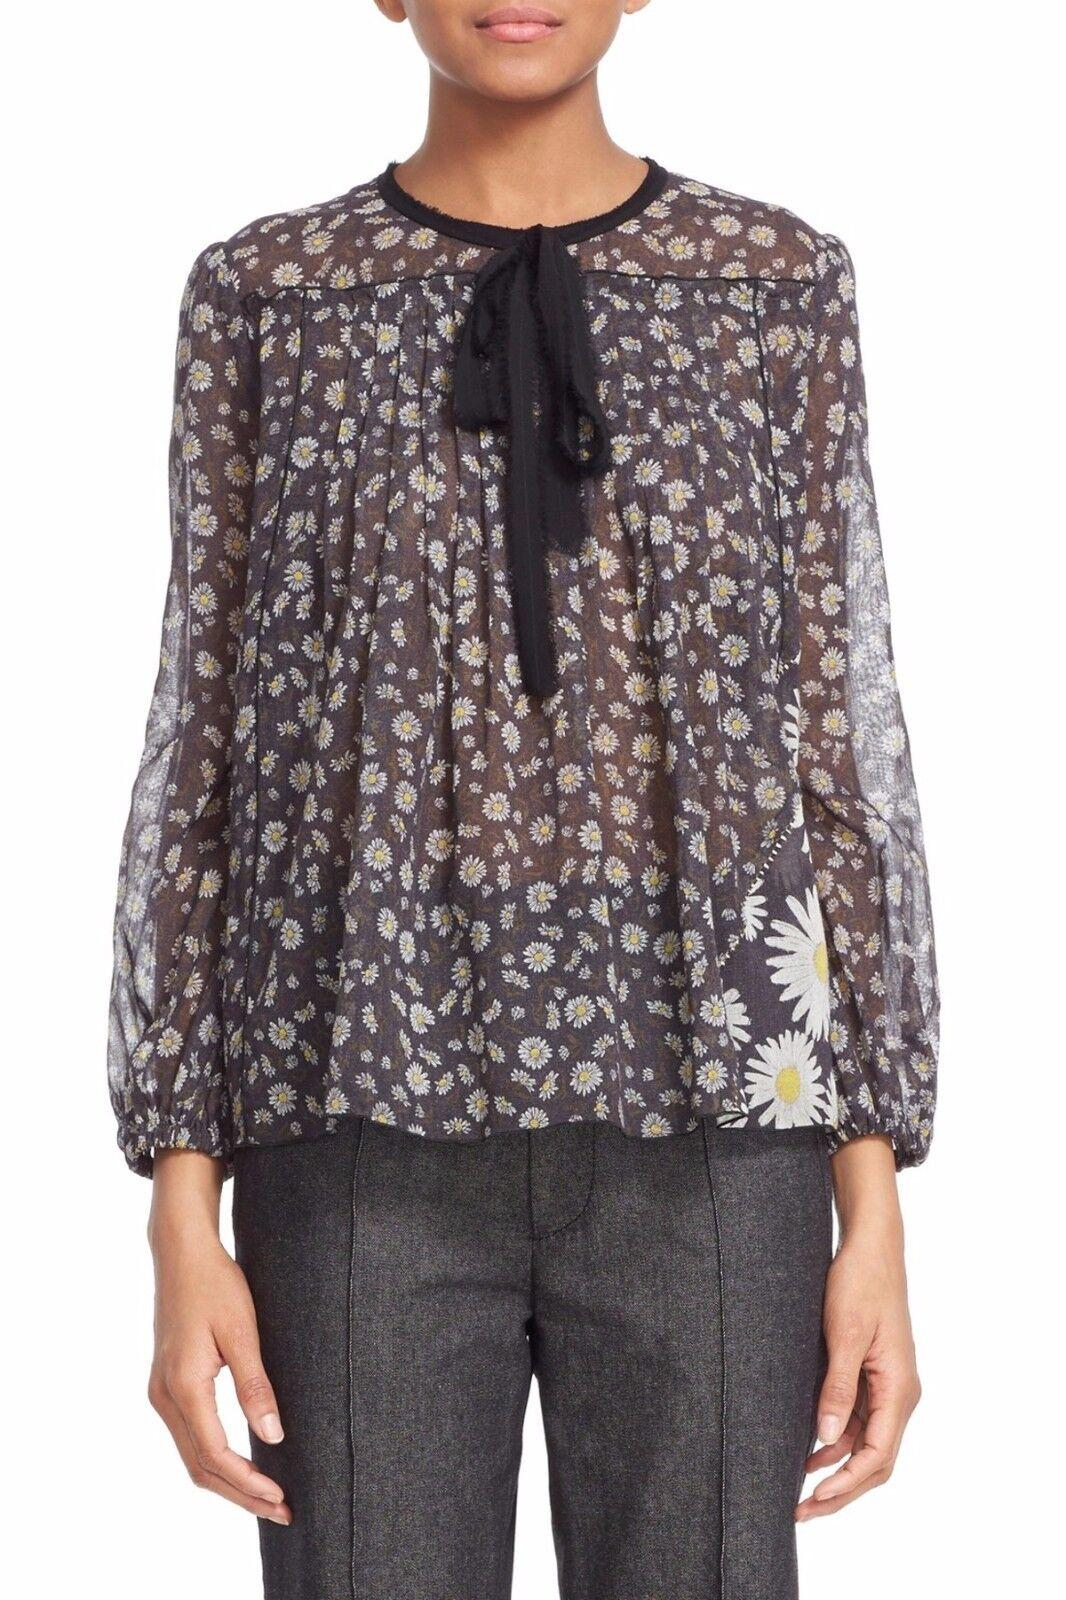 NWT Marc Jacobs Daisy Print Peasant Sheer 100% Cotton Blouse Tie Neck Top Größe 8